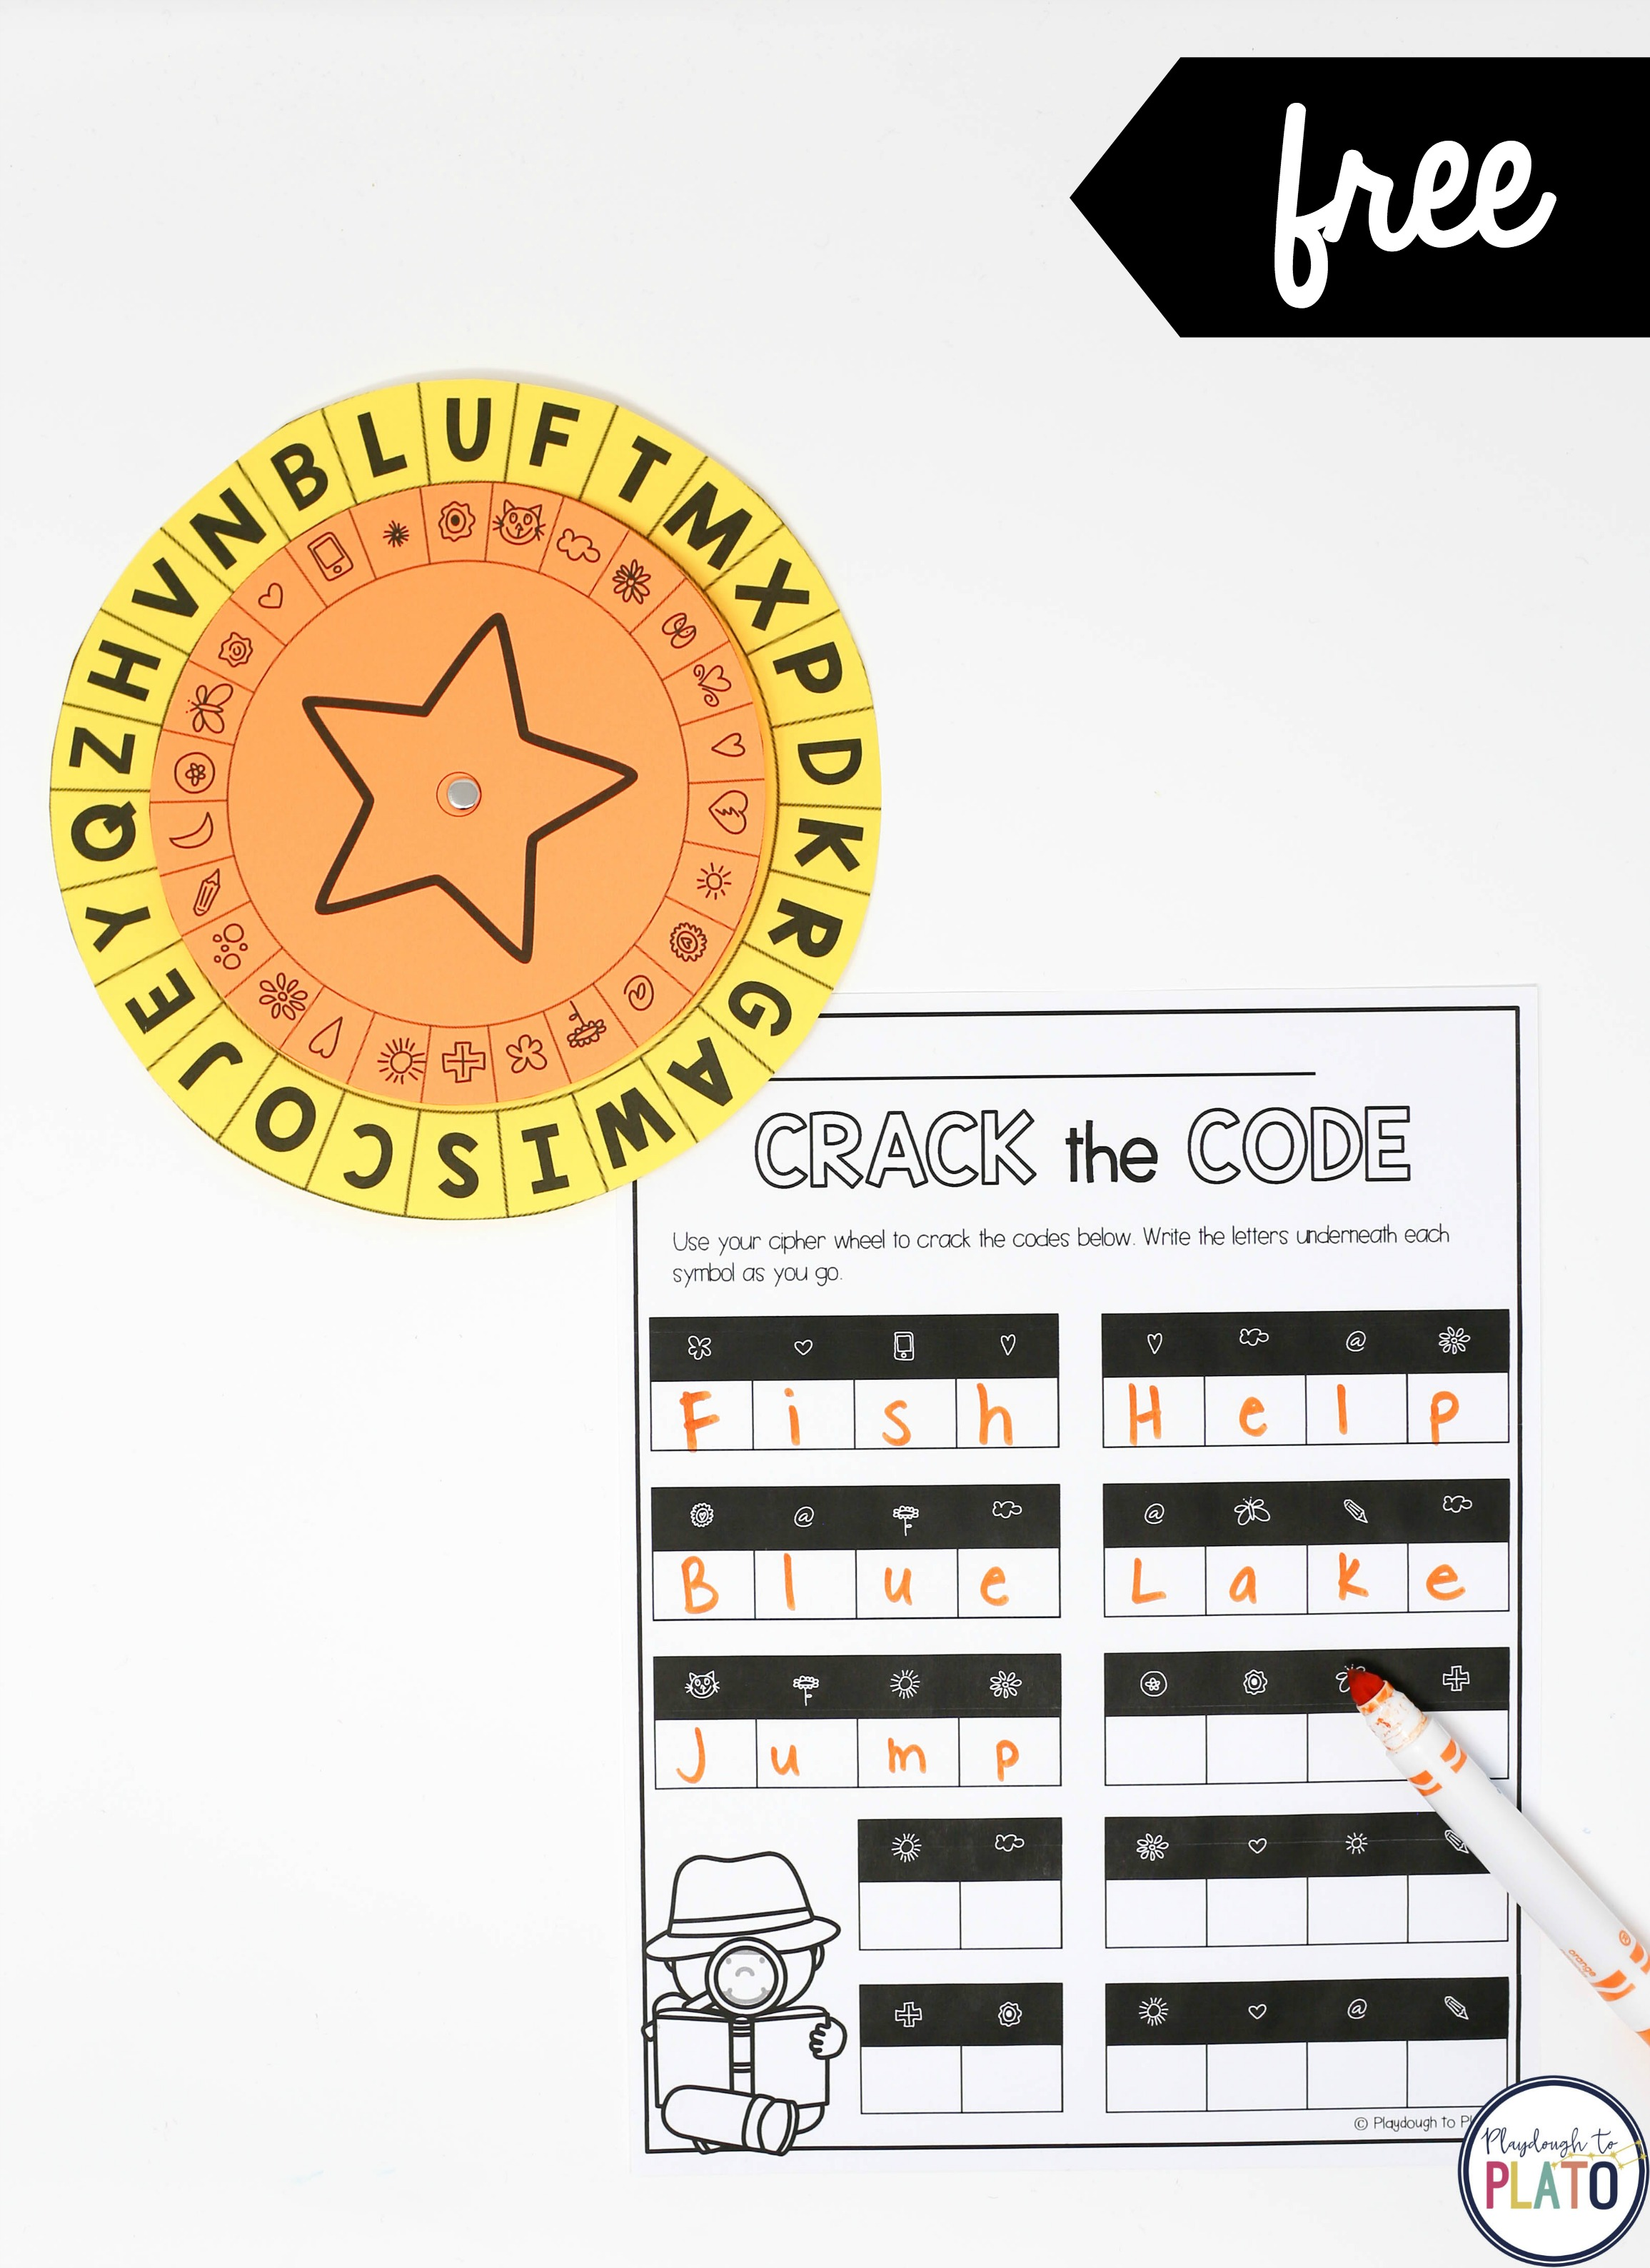 Crack the Code - The Stem Laboratory